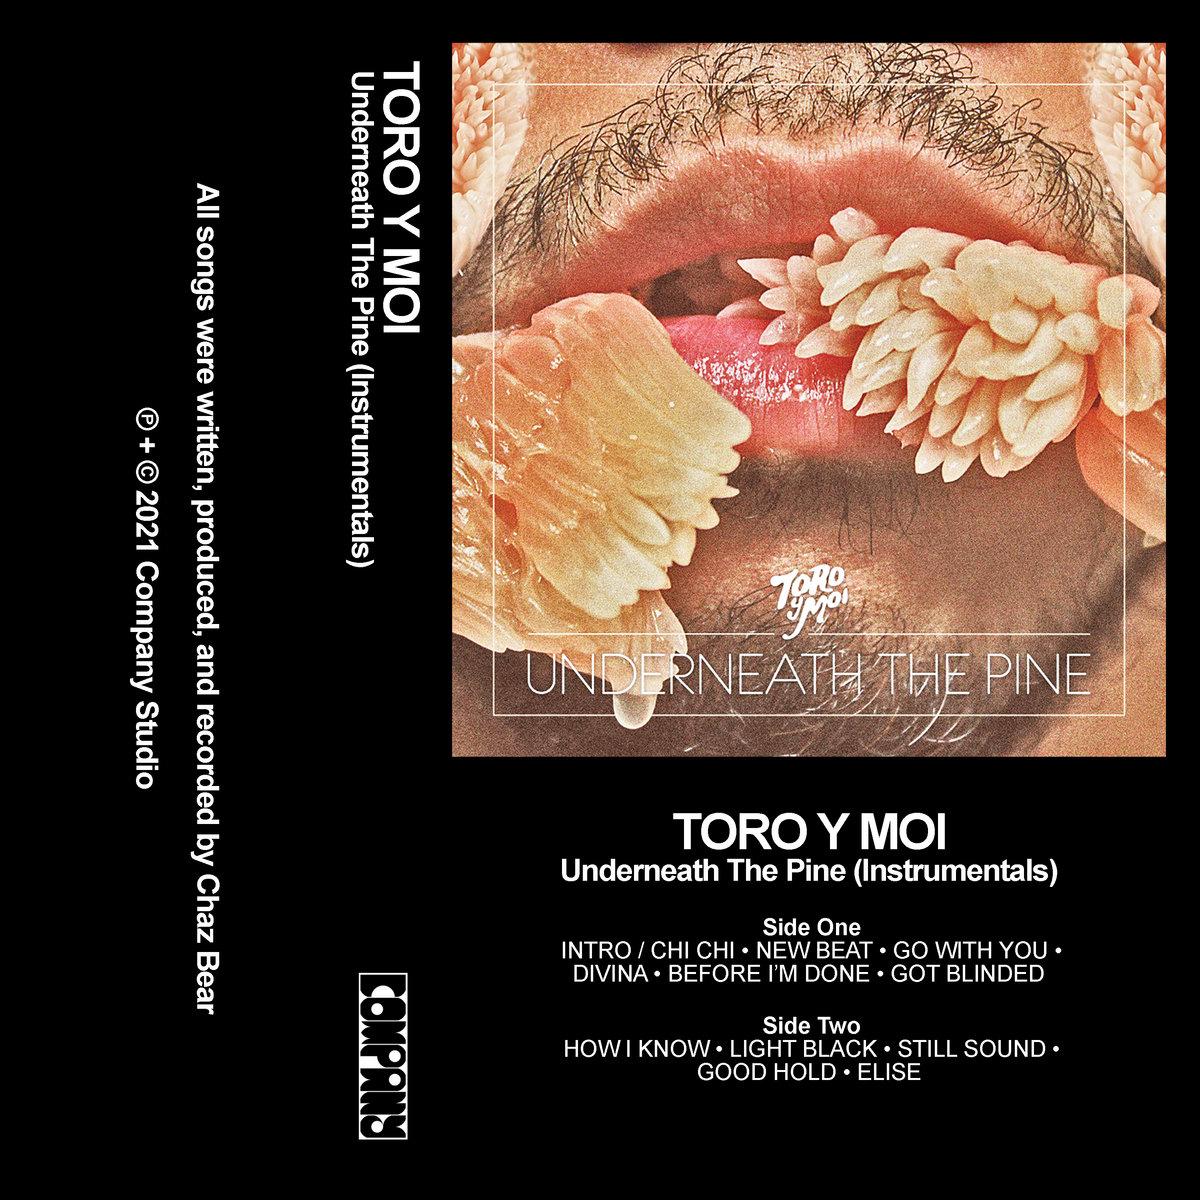 Still Sound Instrumental Toro Y Moi